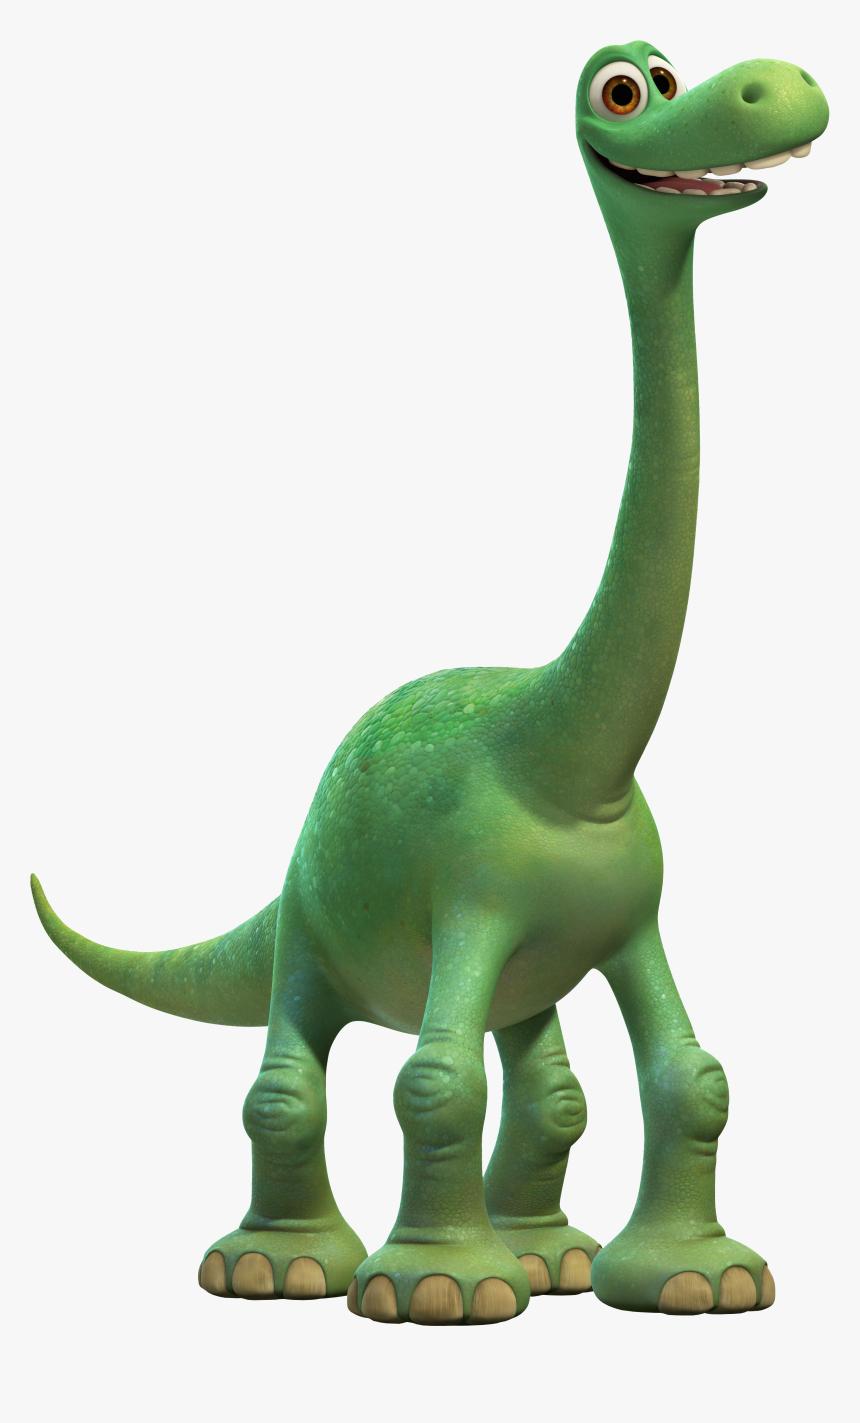 Dinosaur Png Transparent Images - Un Gran Dinosaurio Arlo, Png Download, Free Download